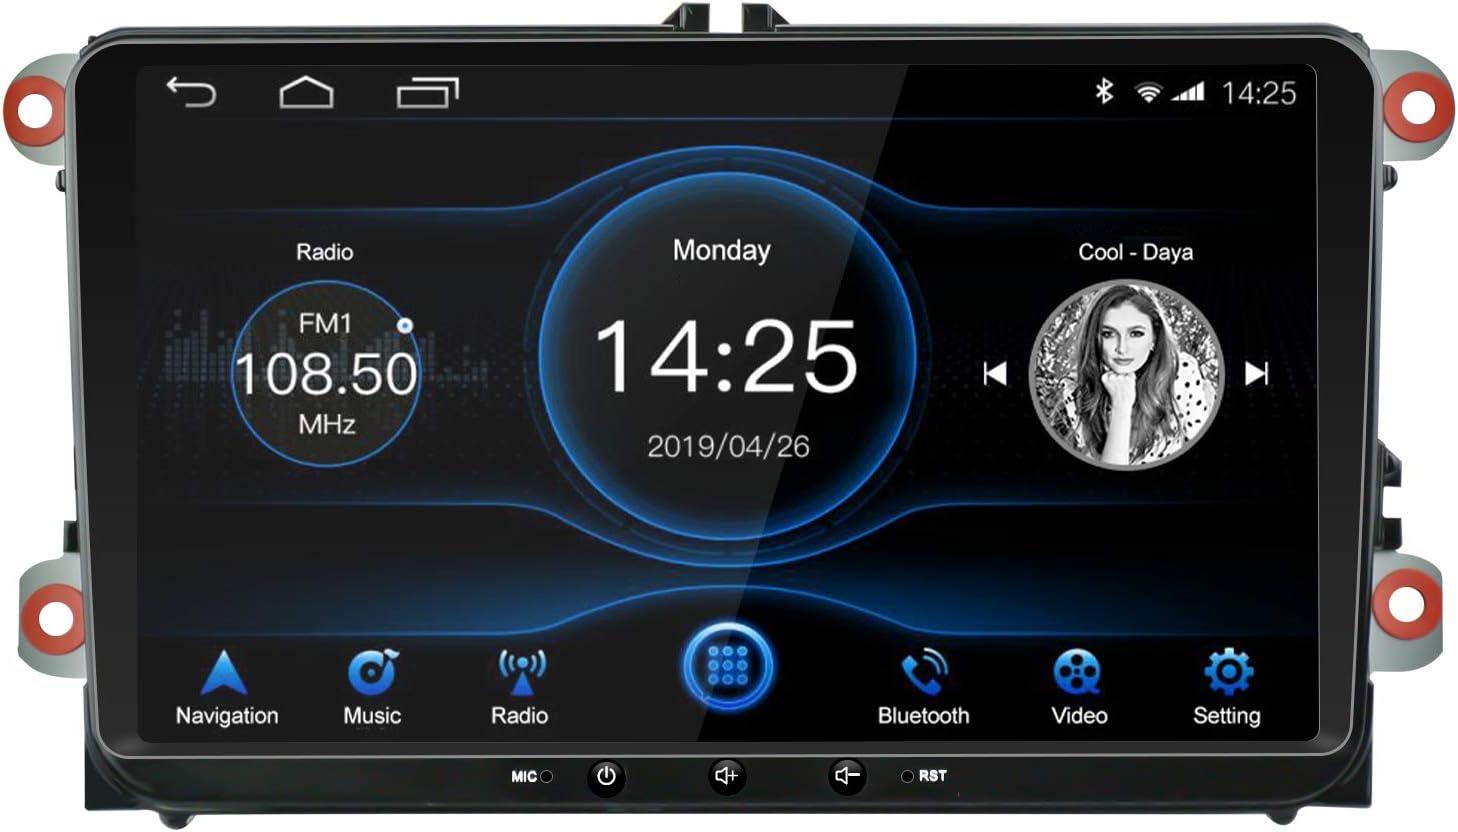 EZoneTronics 1DIN Android 8.1 Car Radio Estéreo 9 pulgadas Pantalla táctil IPS Navegación GPS de BT WFI USB AM FM Player 2G RAM+32G ROM para VW Passat Golf MK5 MK6 Jetta T5 EOS POLO Touran Seat Sharan